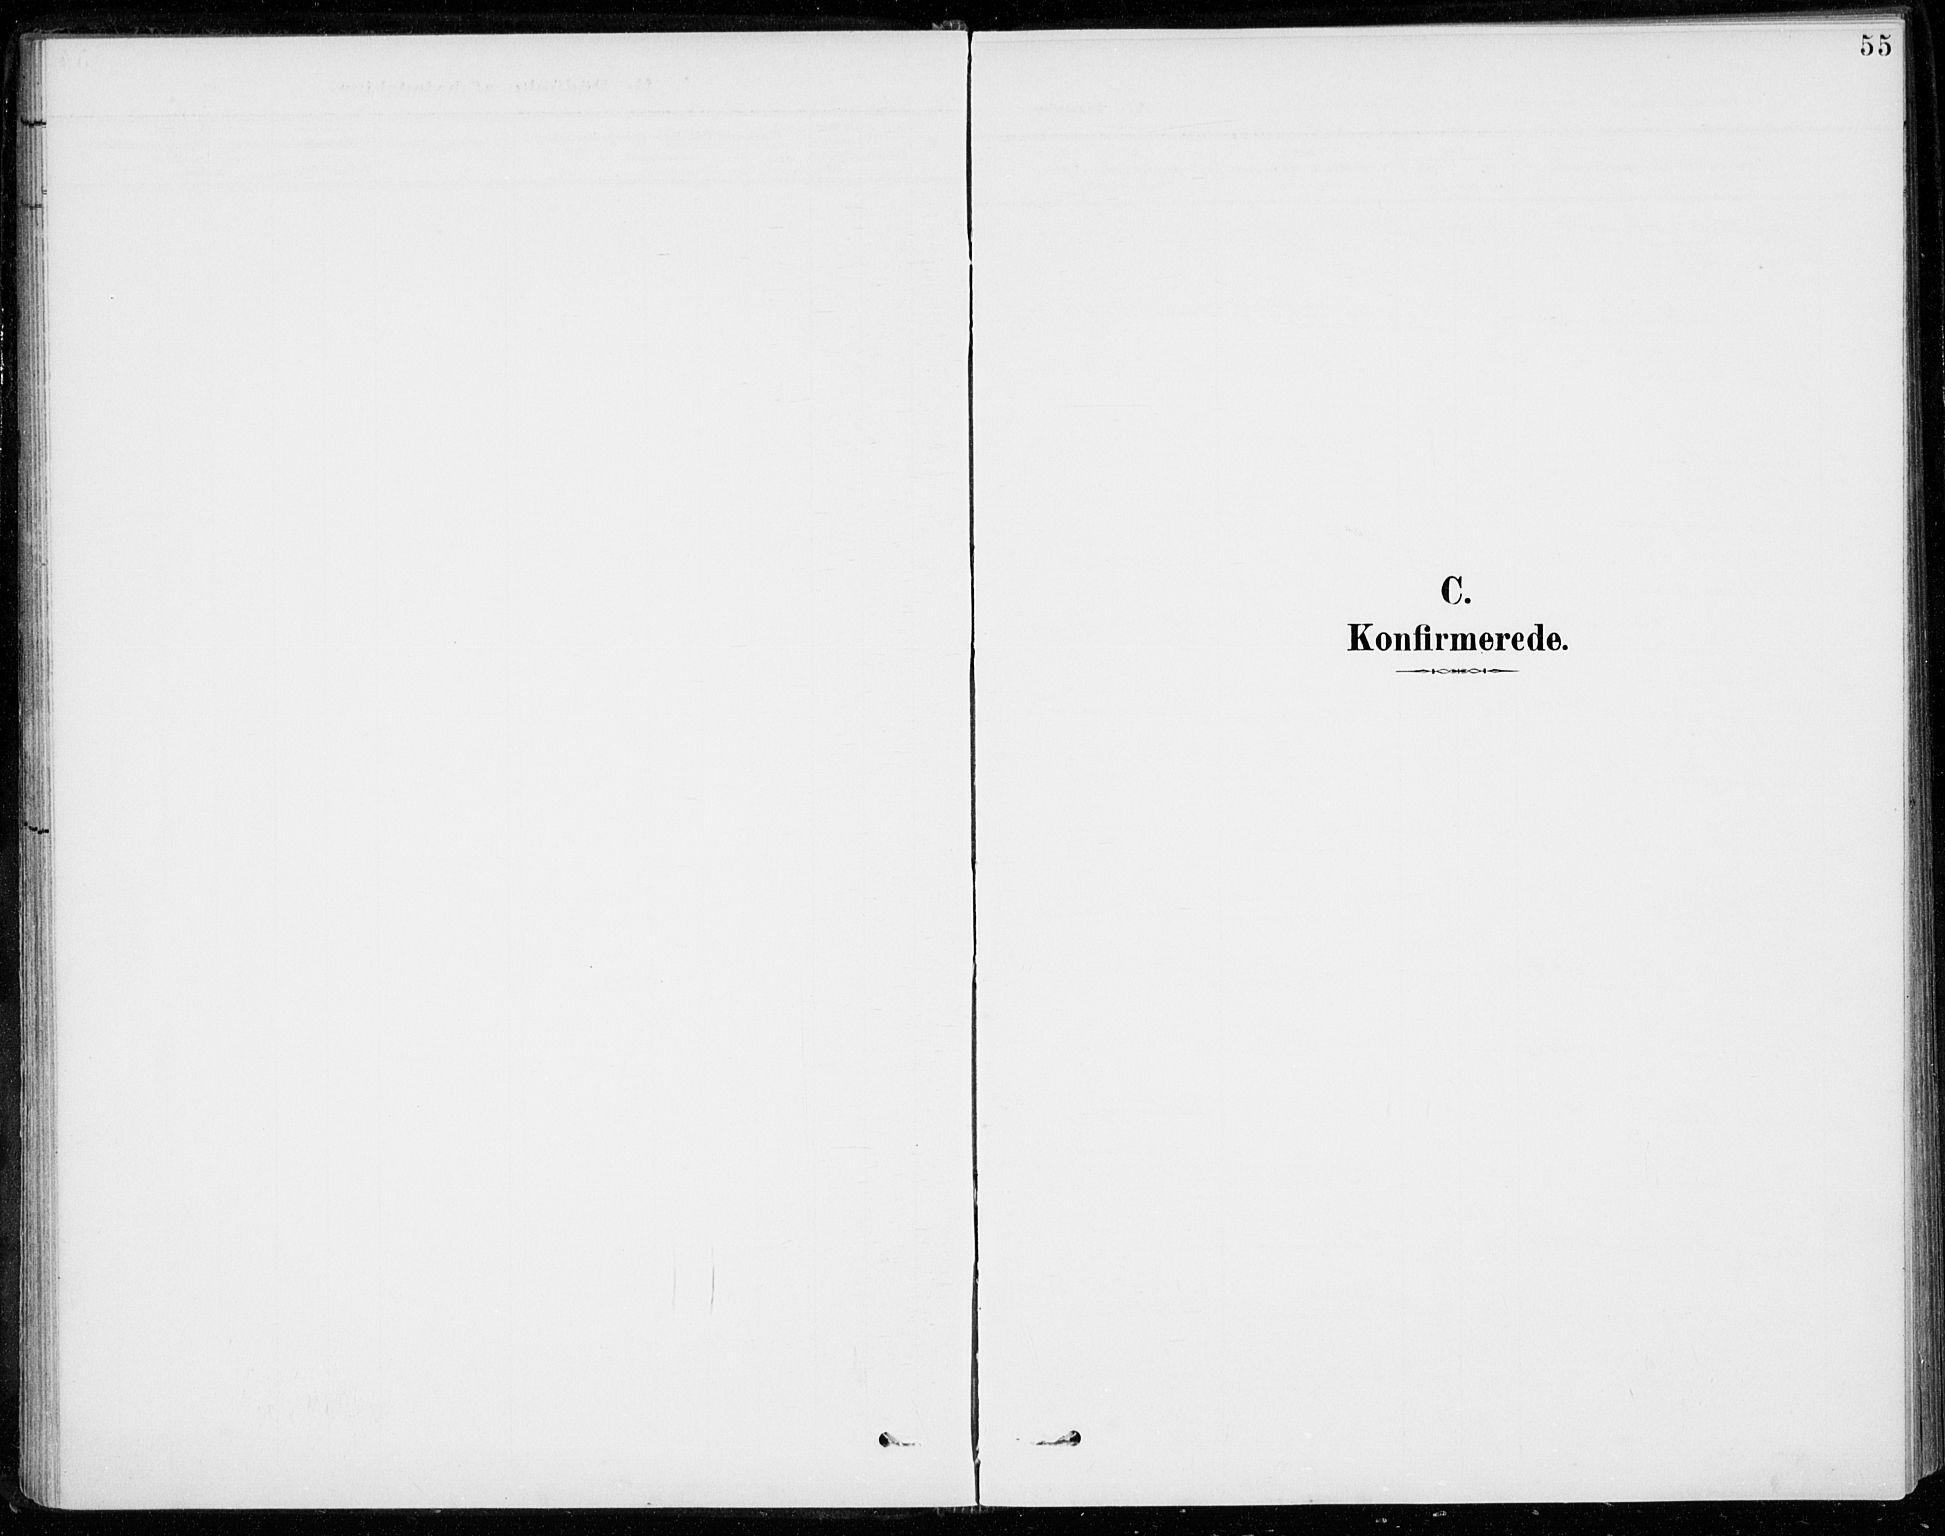 SAKO, Sigdal kirkebøker, F/Fc/L0002: Ministerialbok nr. III 2, 1894-1911, s. 55